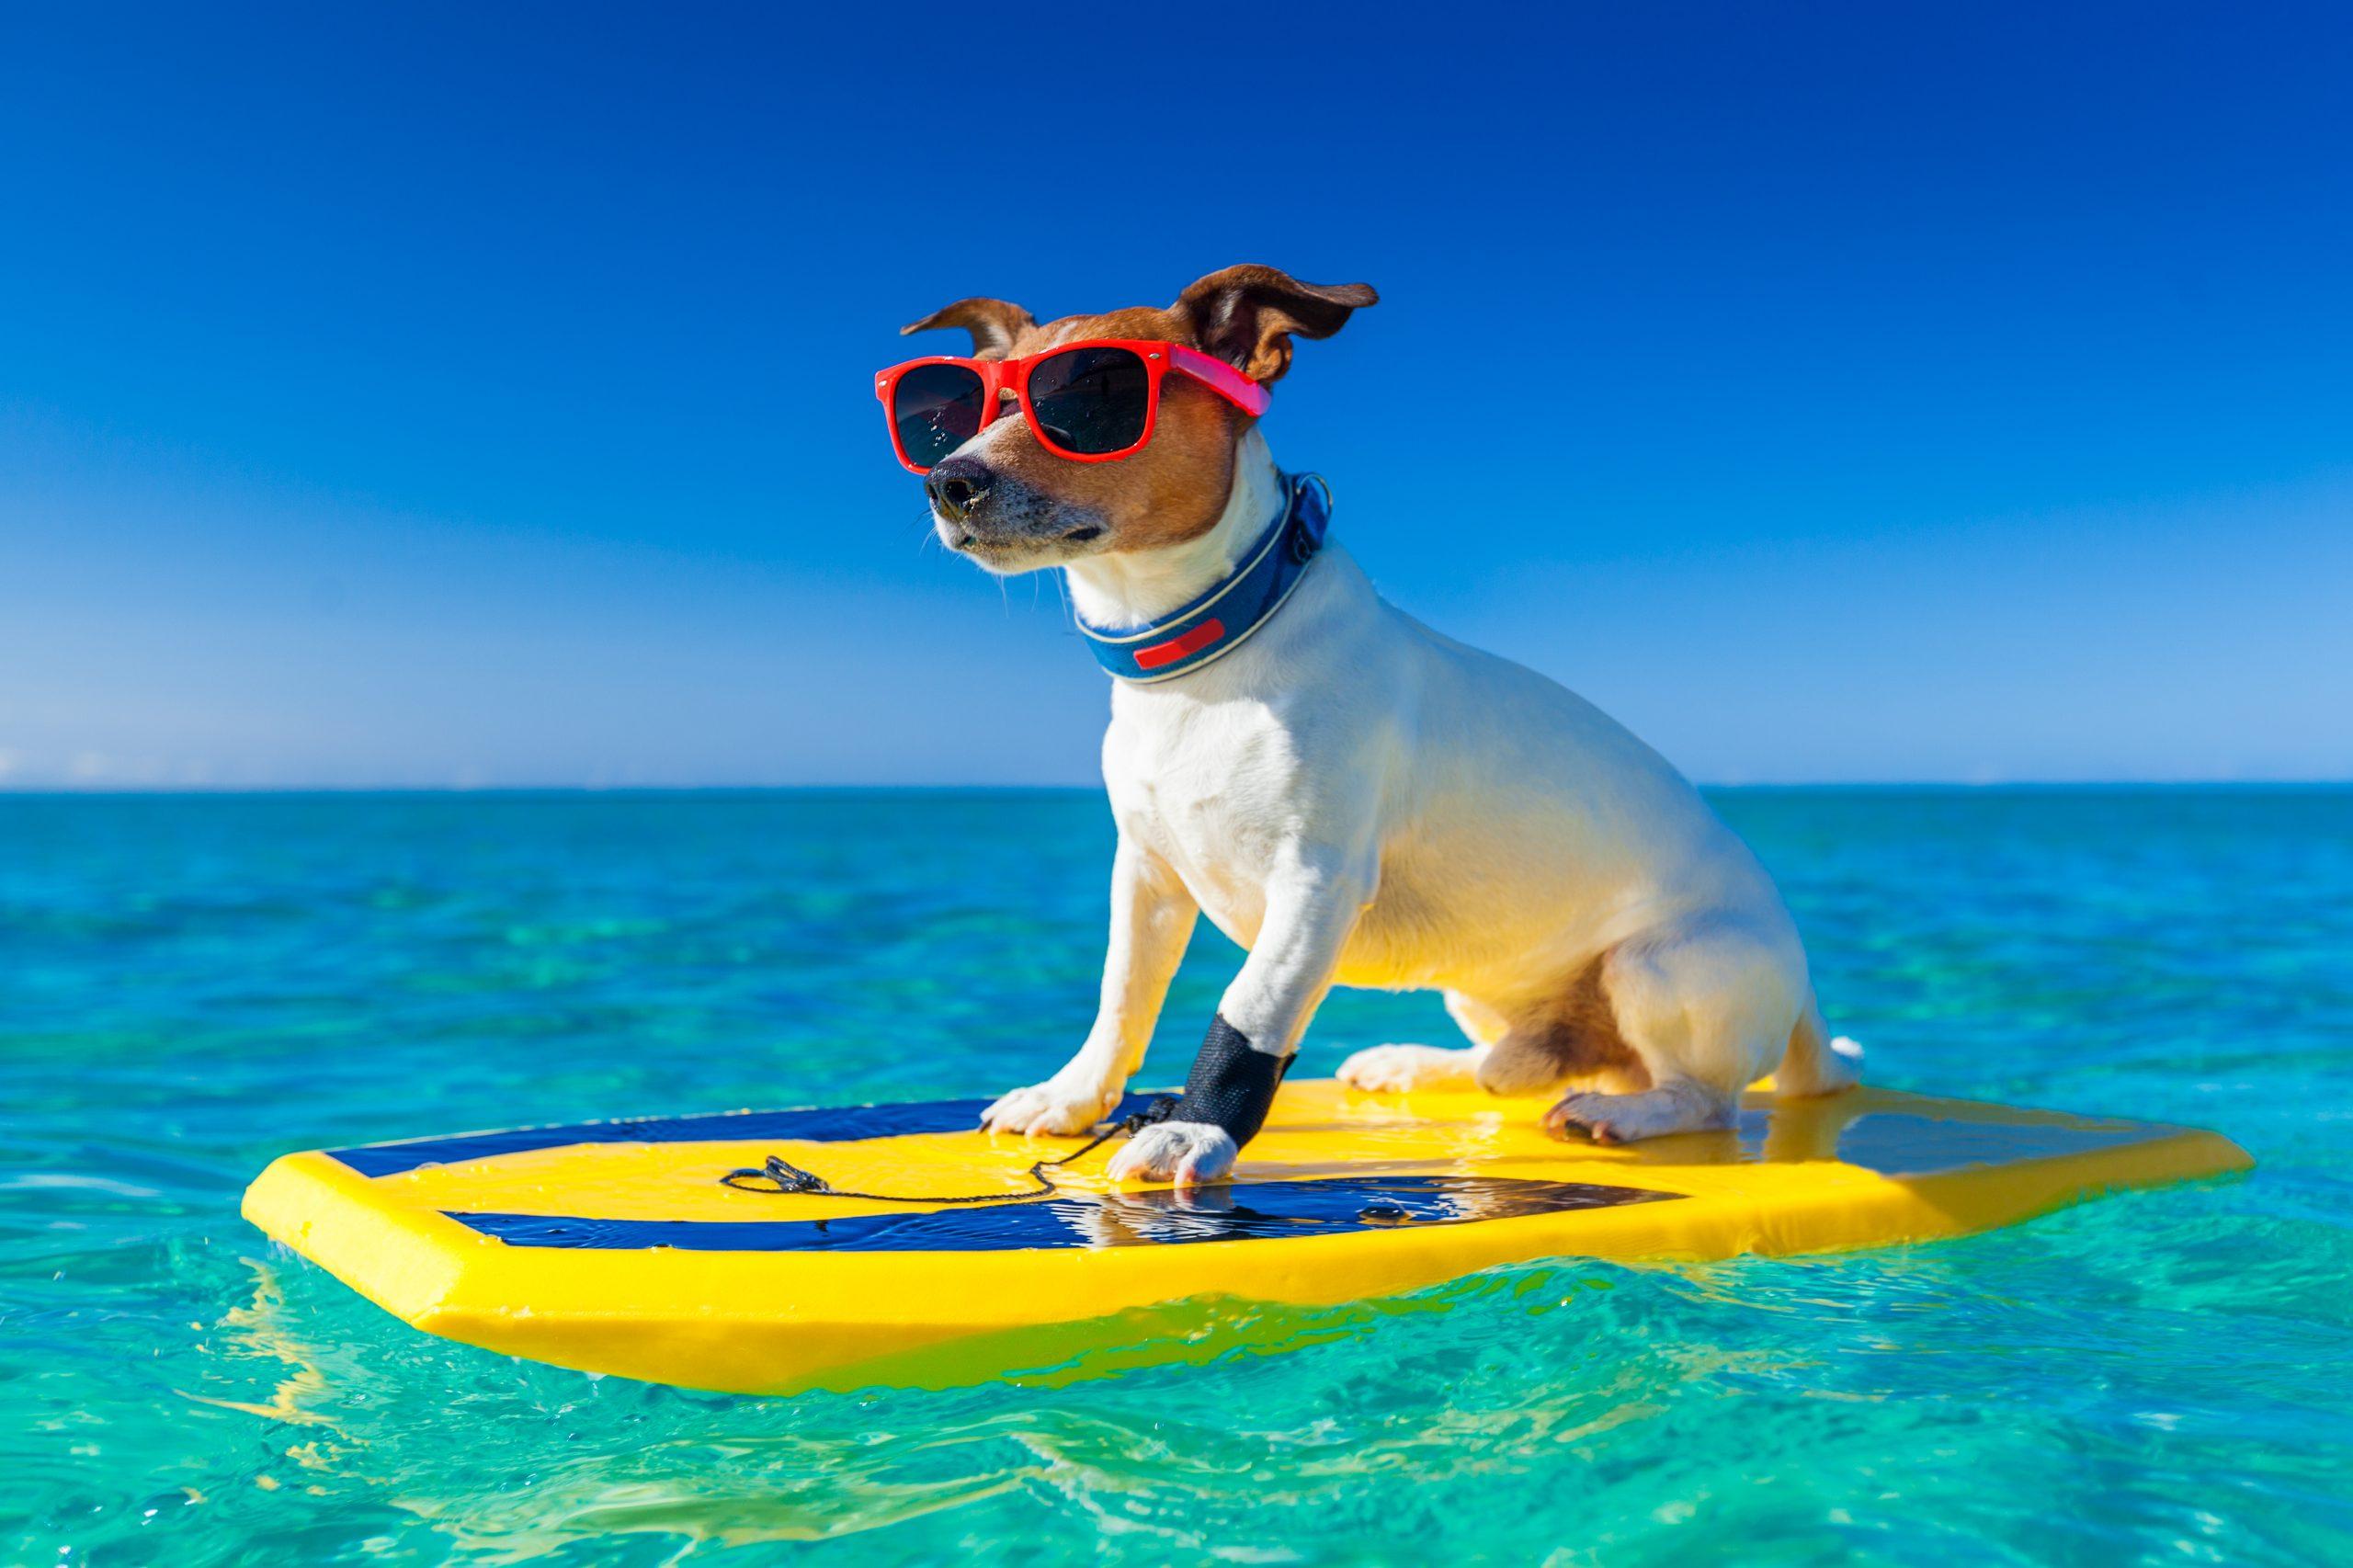 Barks and Bites - https://depositphotos.com/54663119/stock-photo-surfer-dog.html